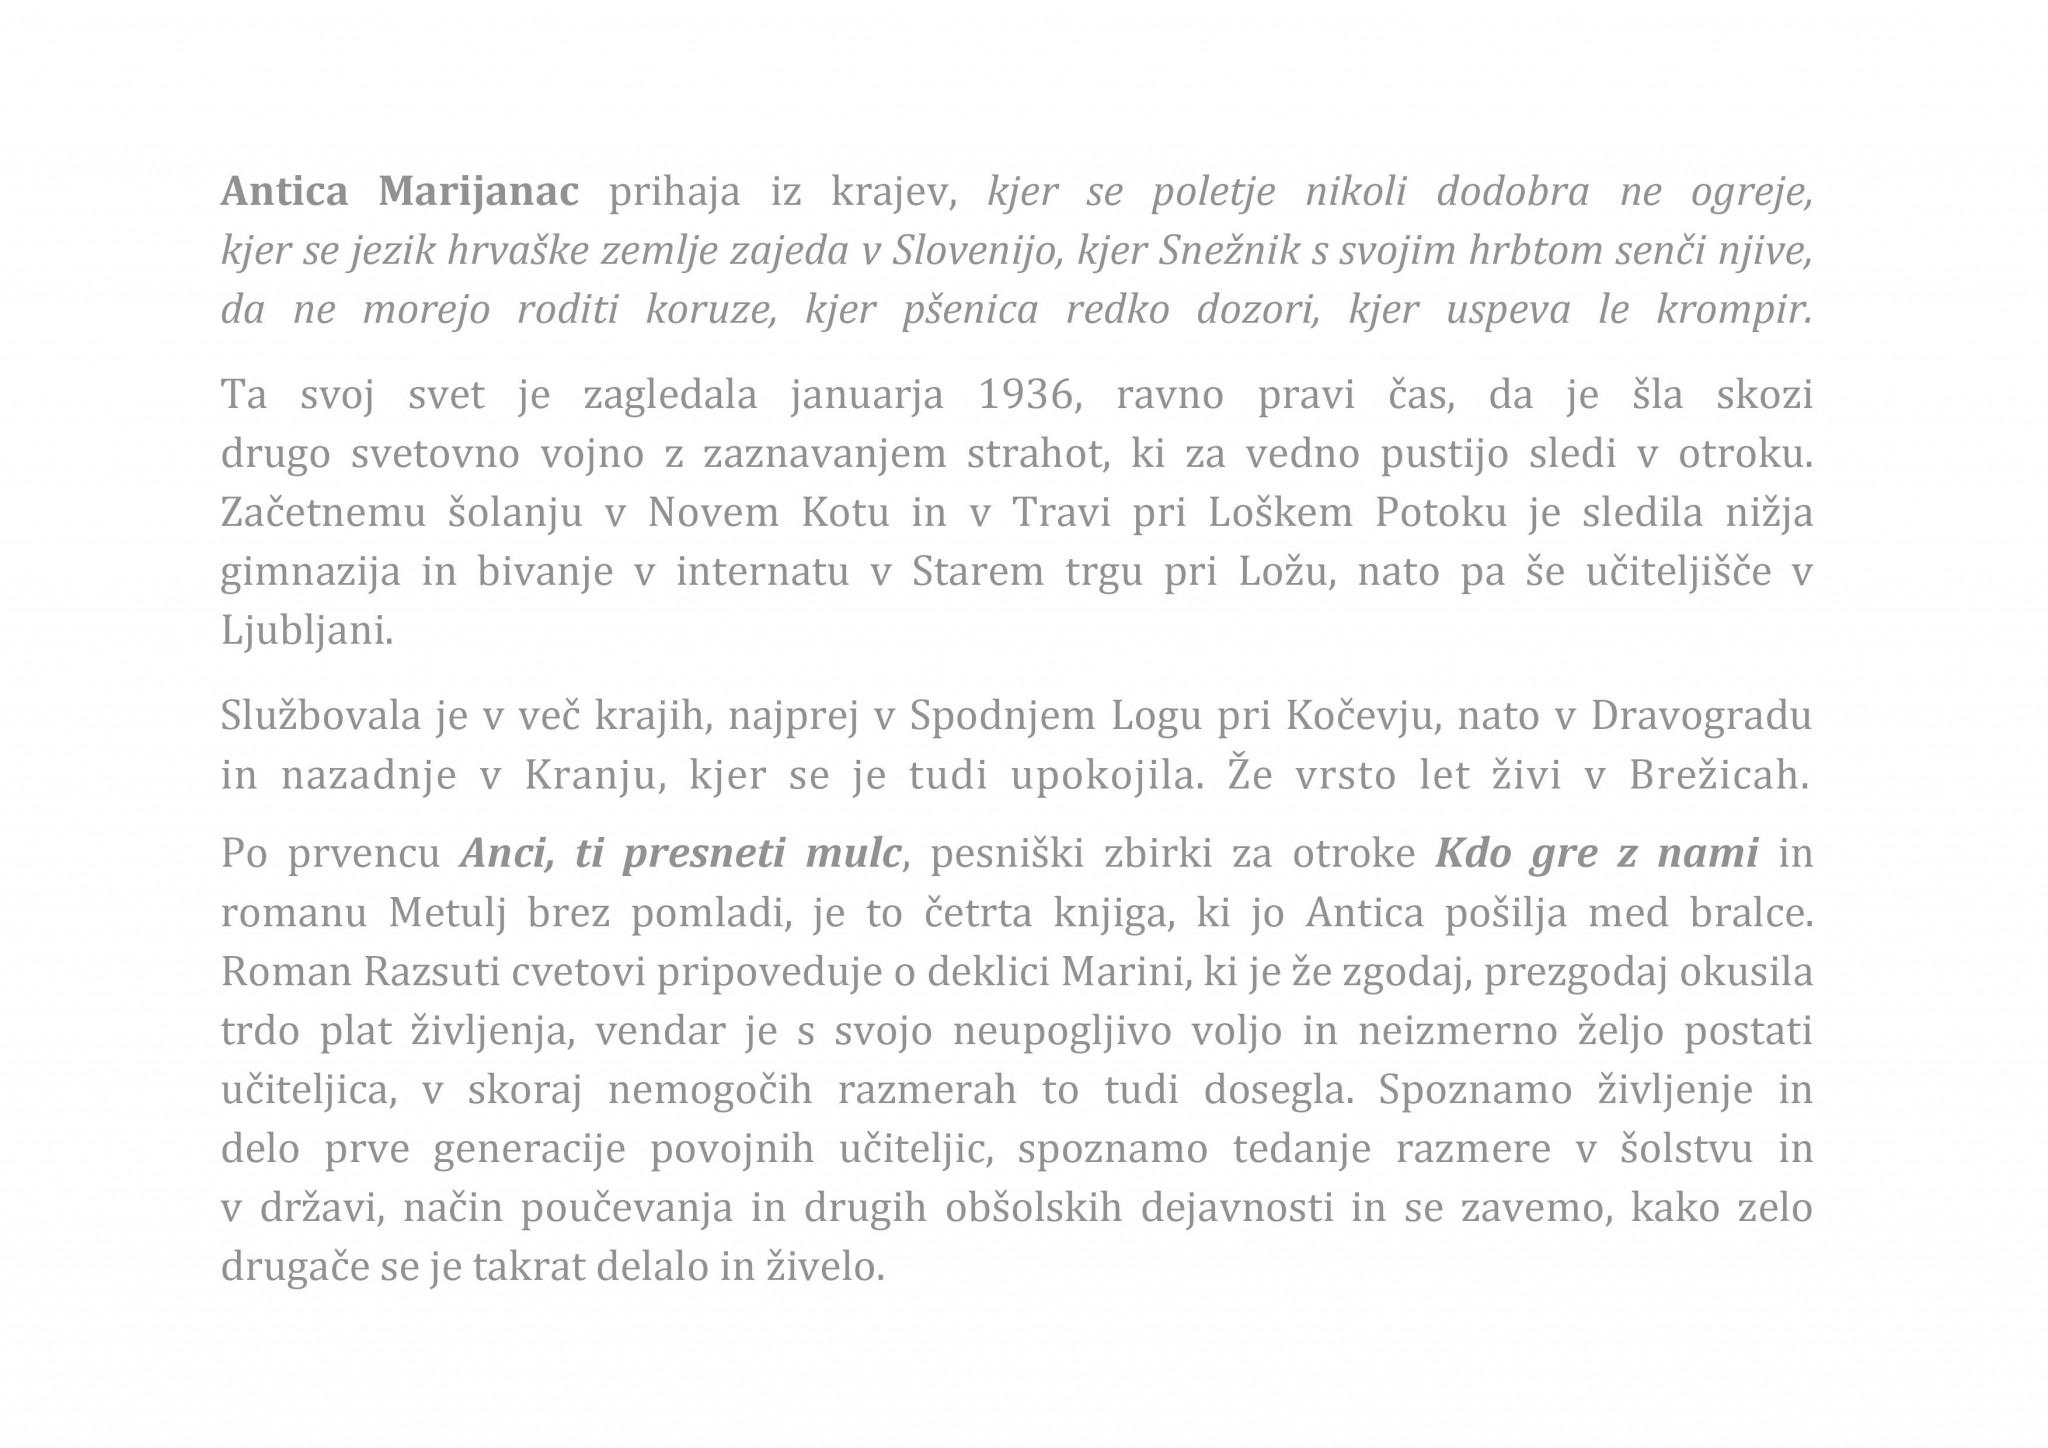 Antica Marijanac. 2016 page 002 - Antica Marijanac: Razsuti cvetovi